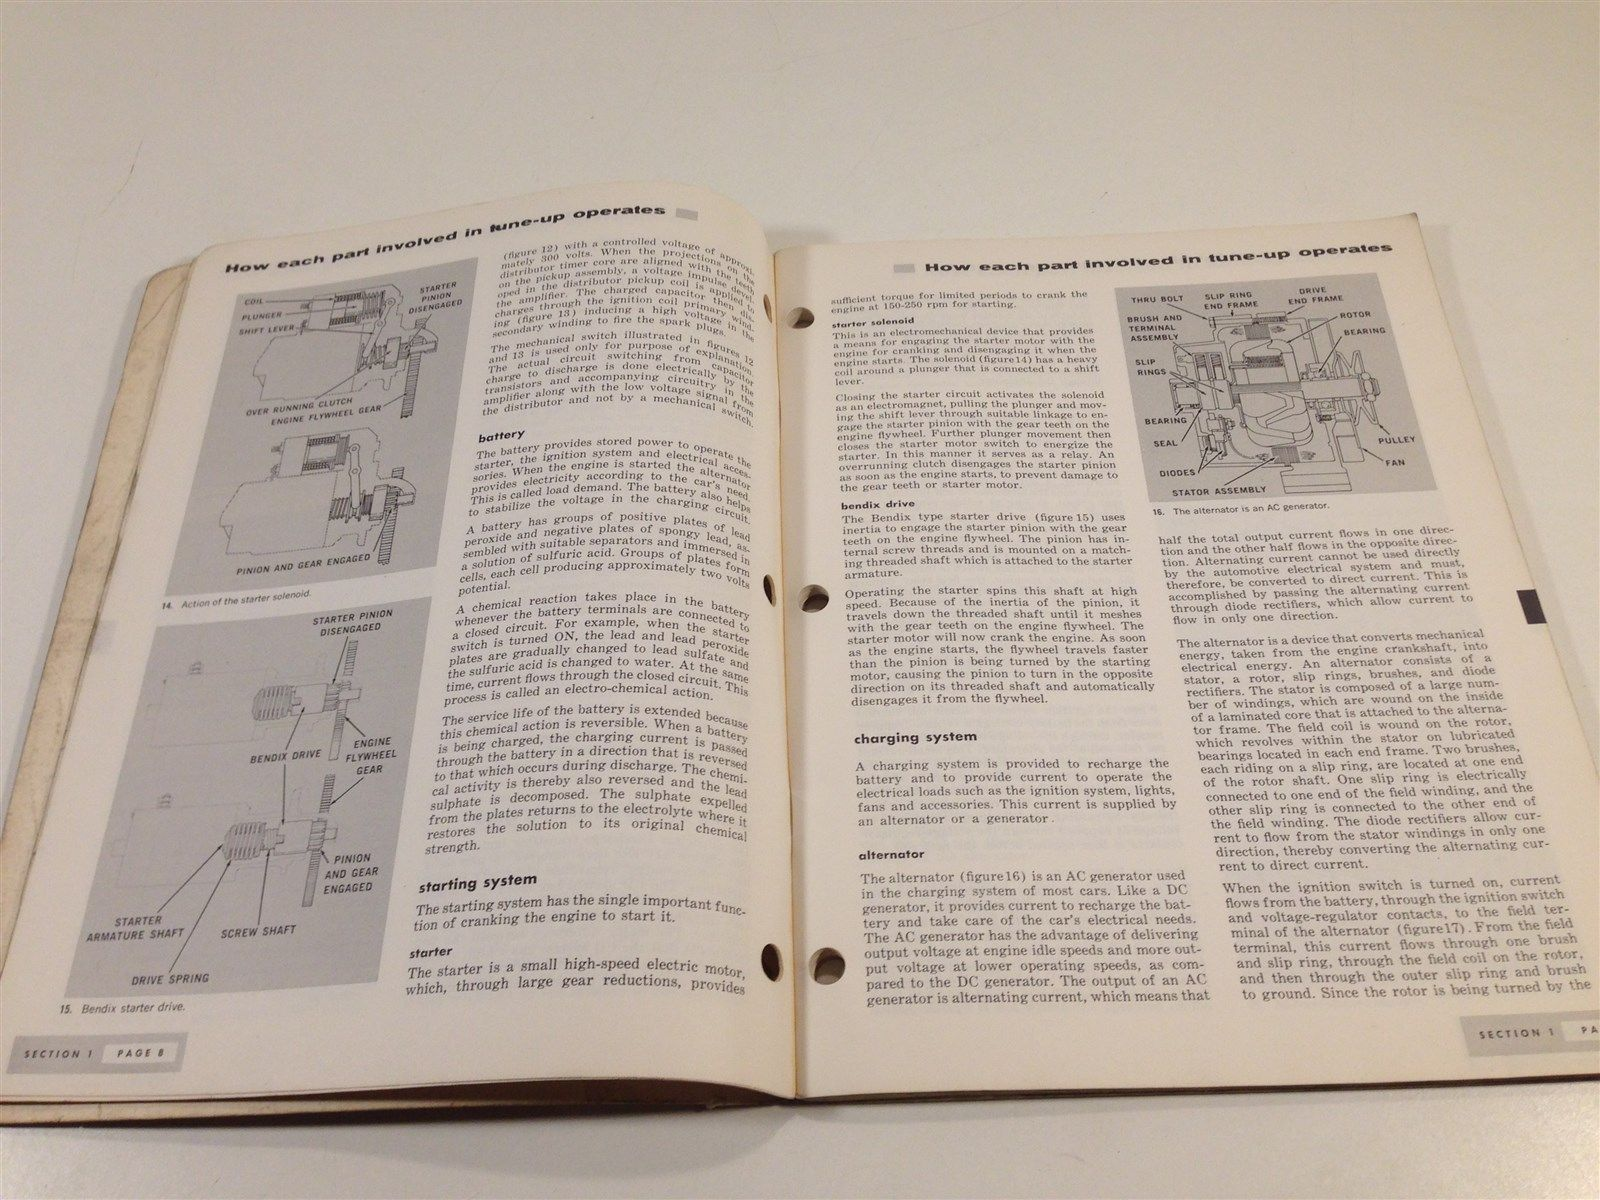 1969 Atlas Supply Company Basic Tune-Up Training Illustrated